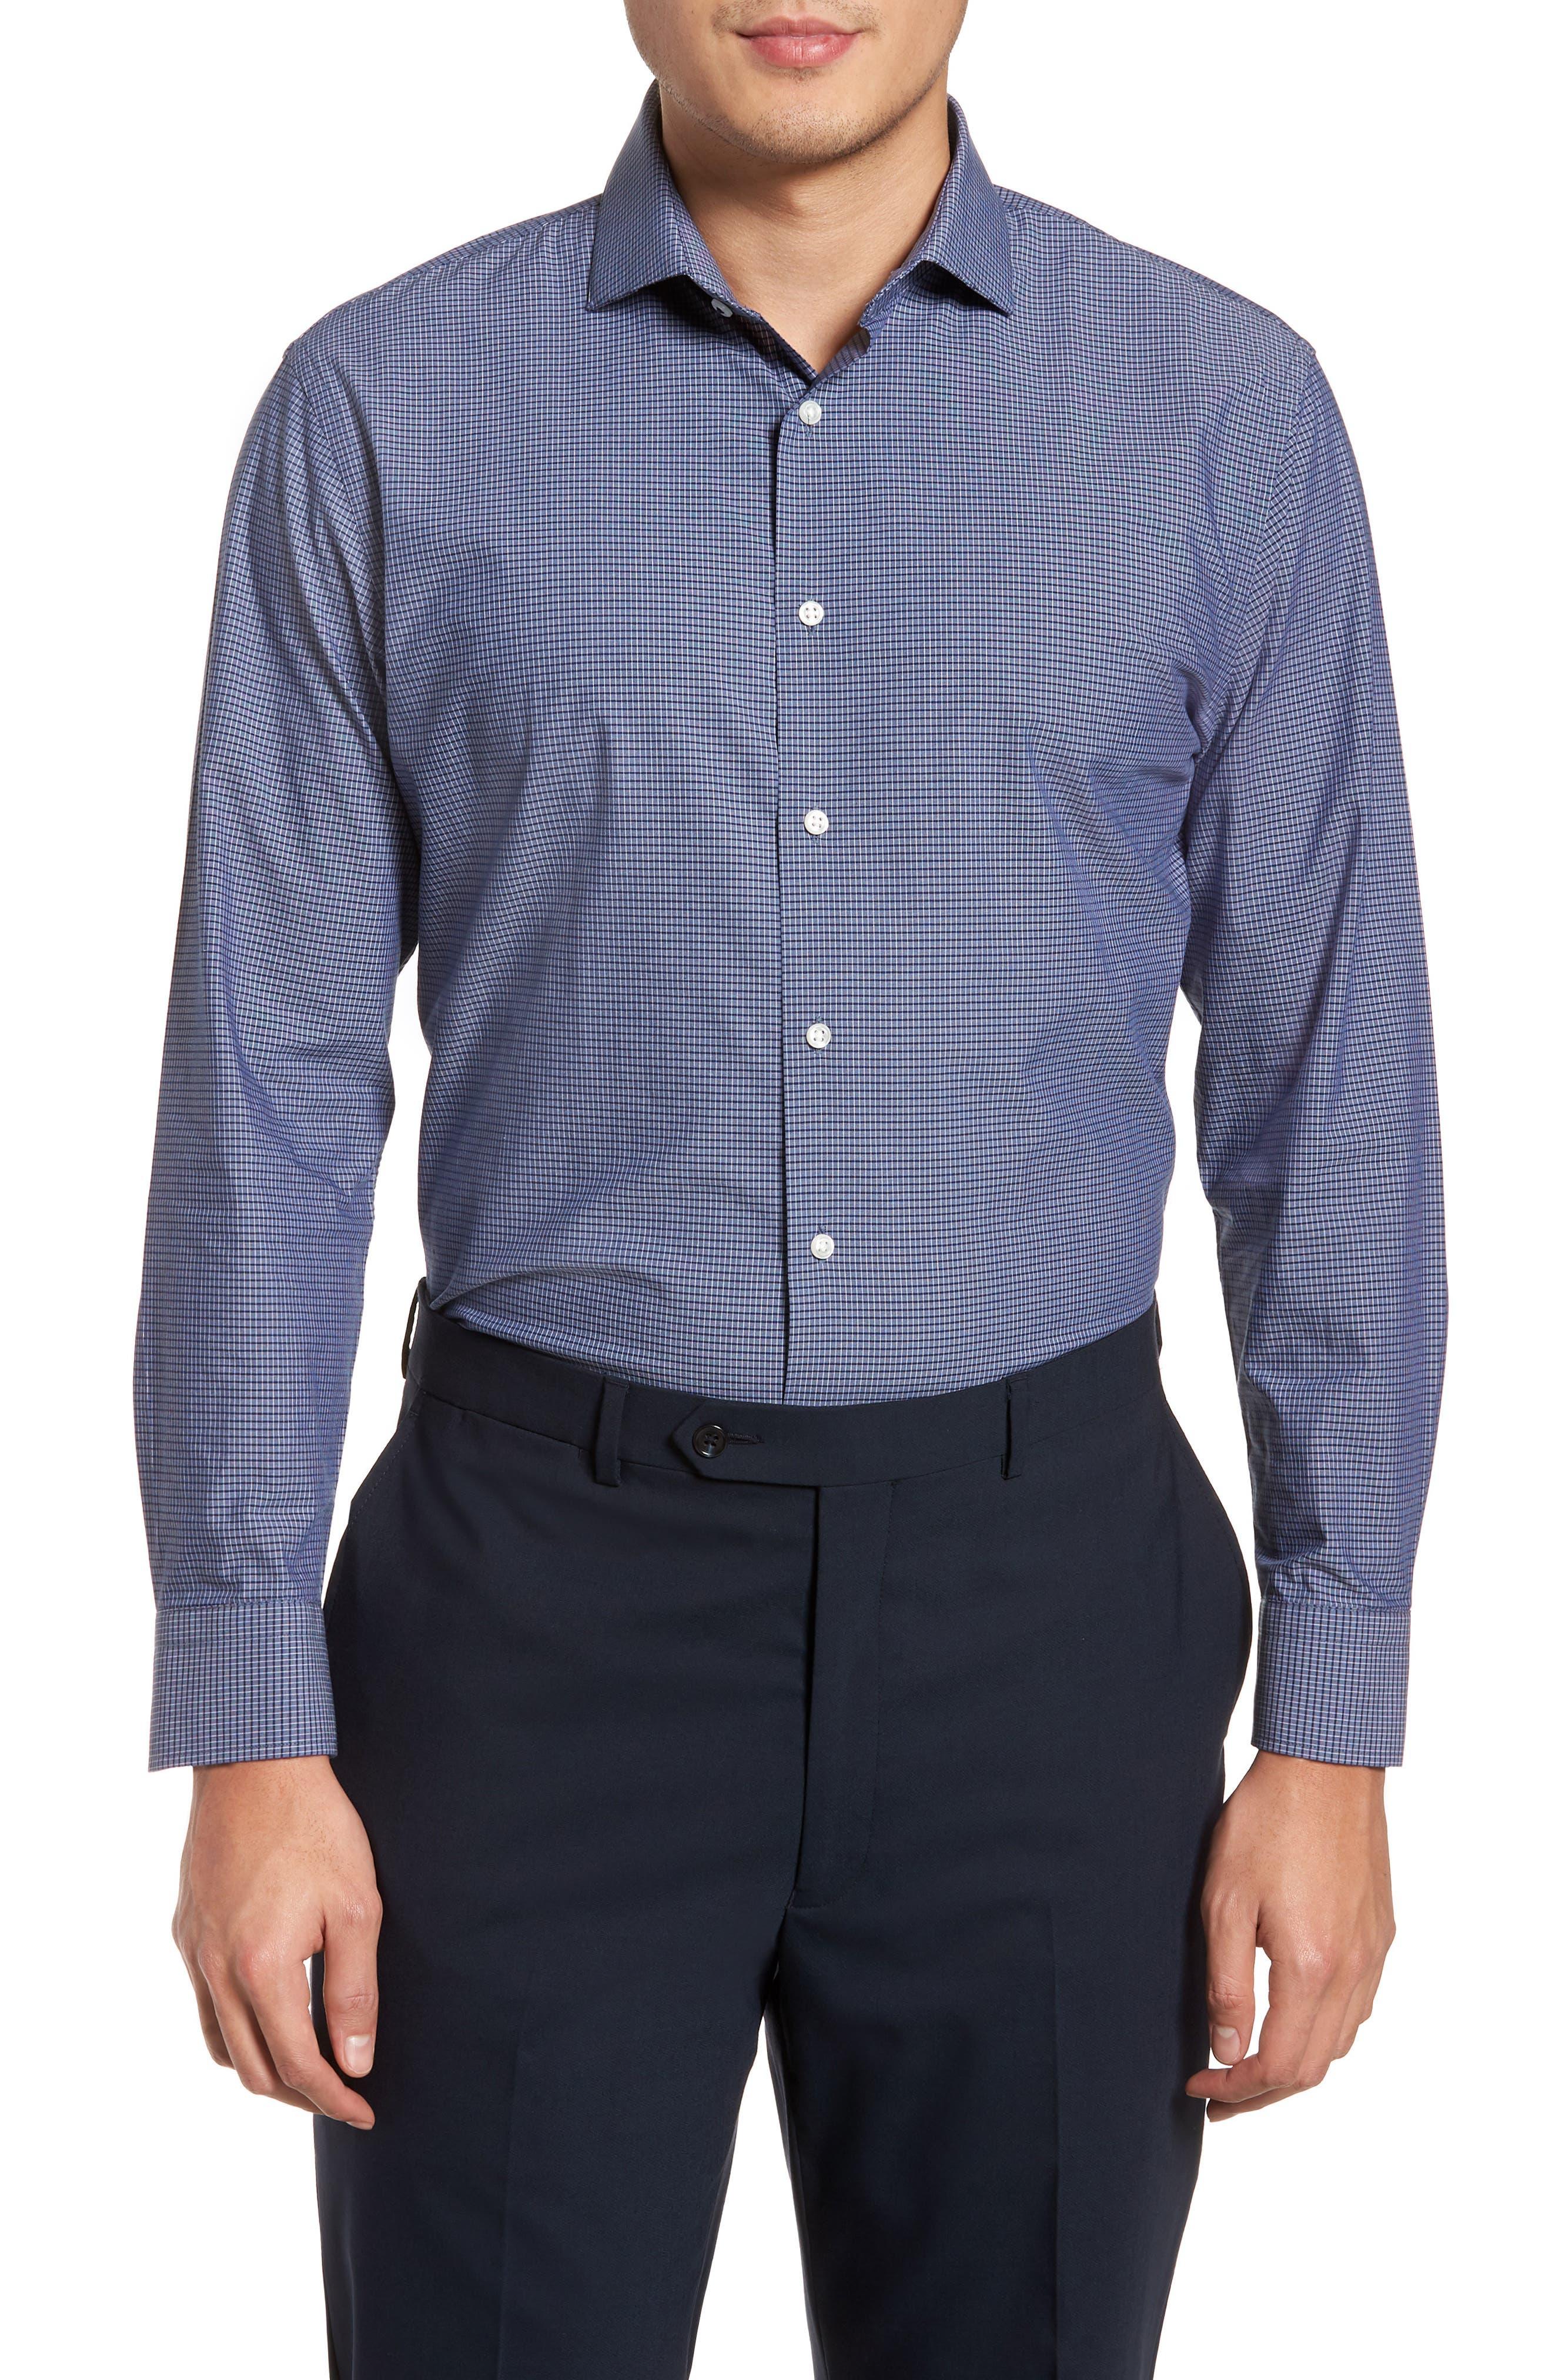 Tech-Smart Trim Fit Stretch Check Dress Shirt,                             Main thumbnail 1, color,                             410